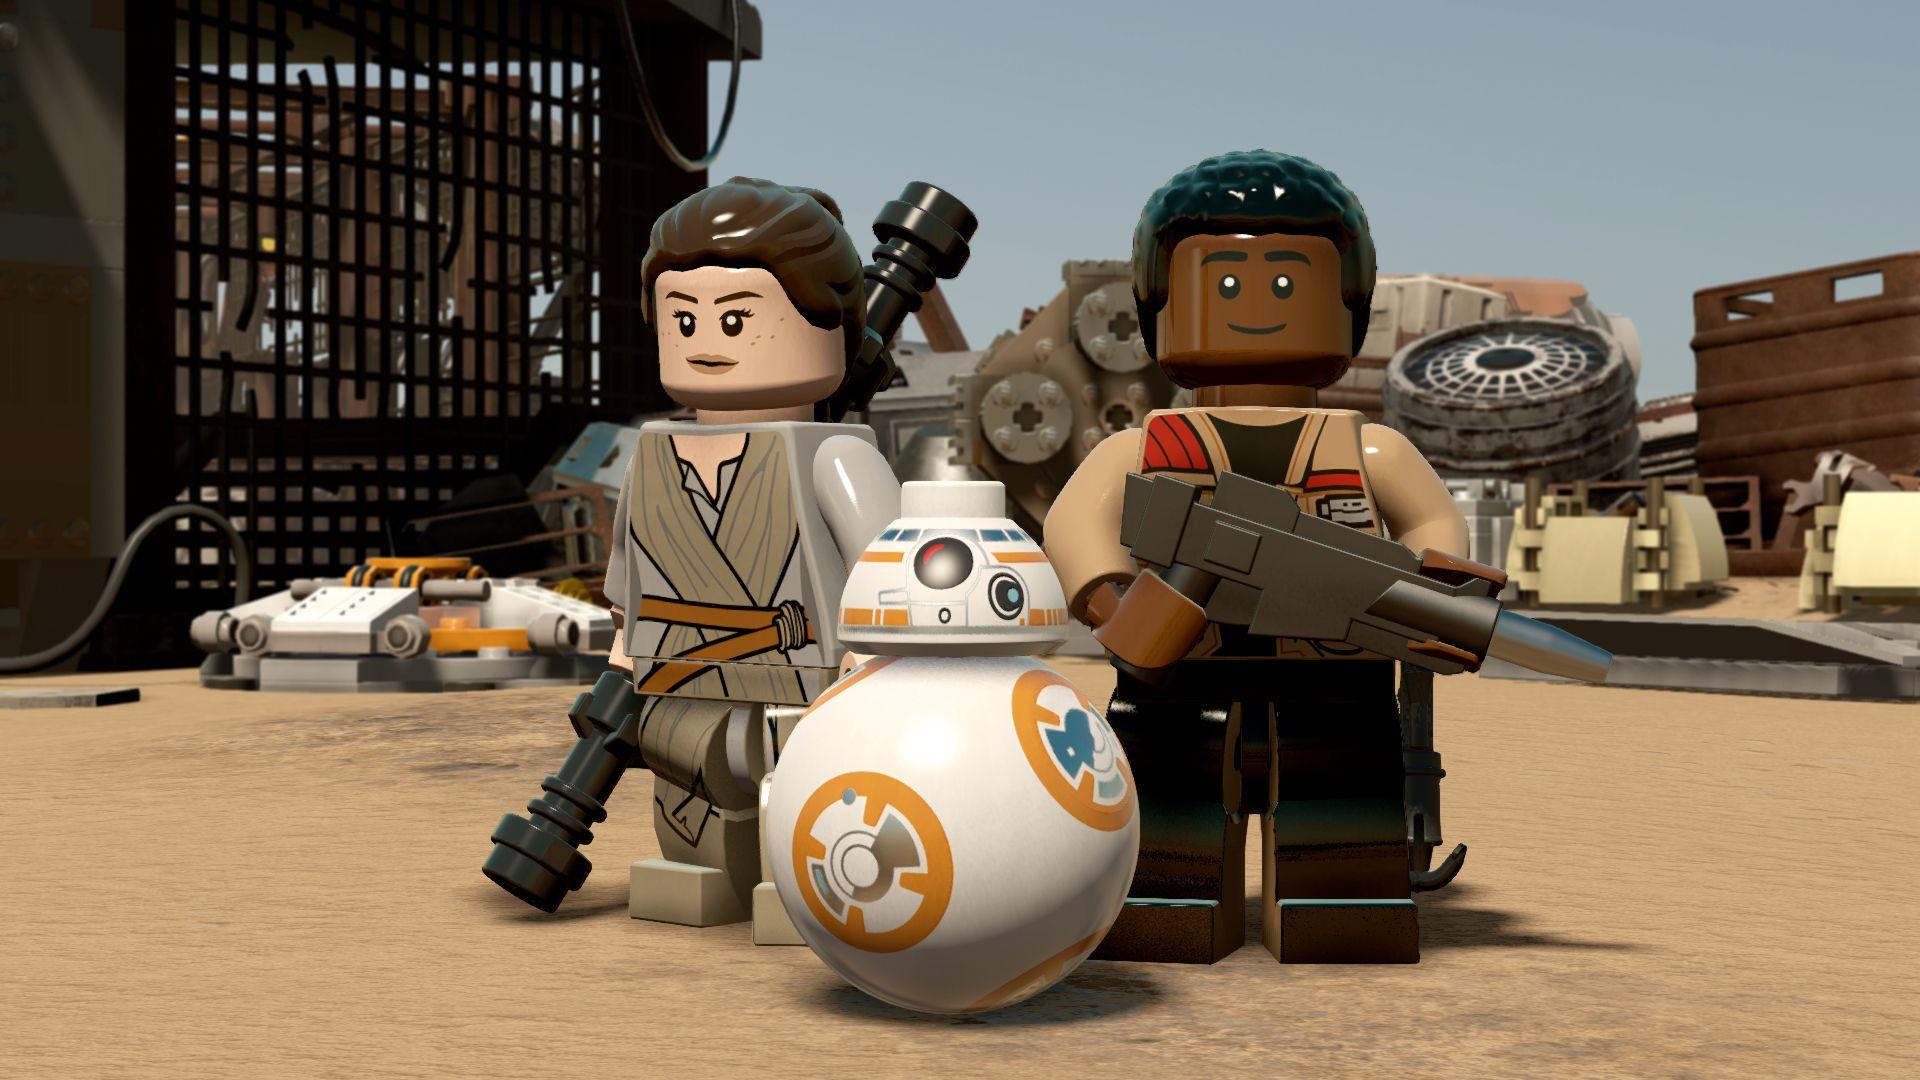 lego-star-wars-the-force-awakens_1107181